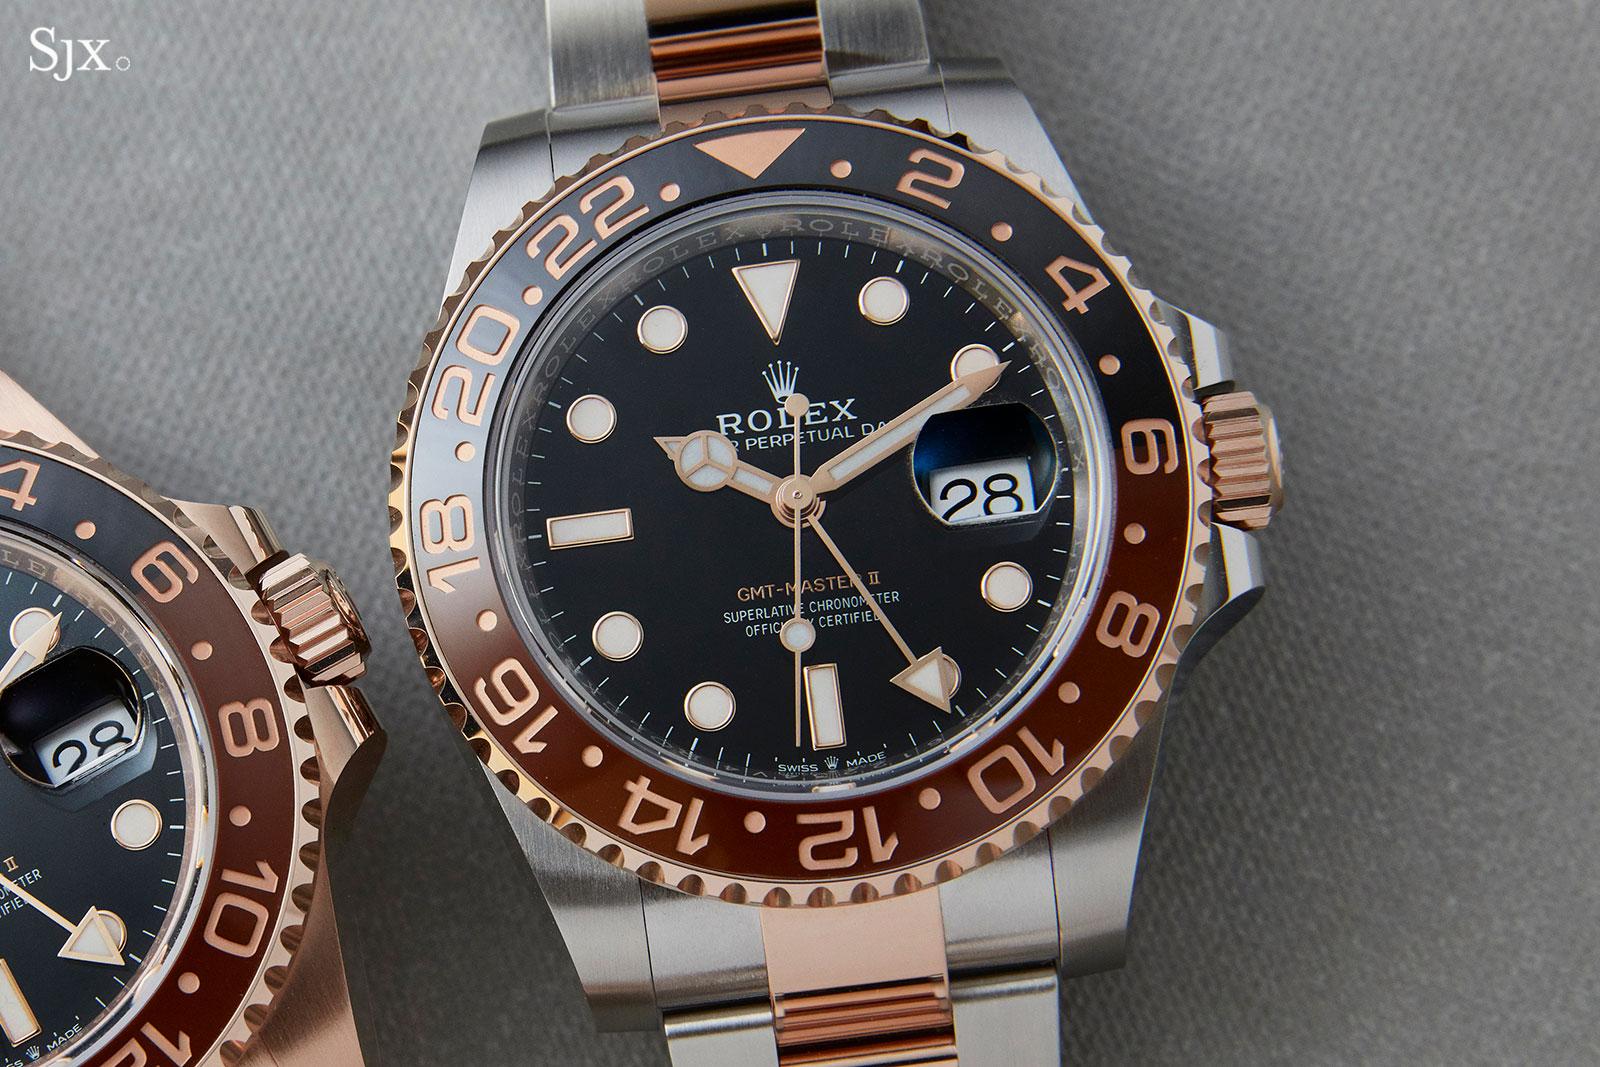 Rolex GMT-Master II 126711 CHNR 3